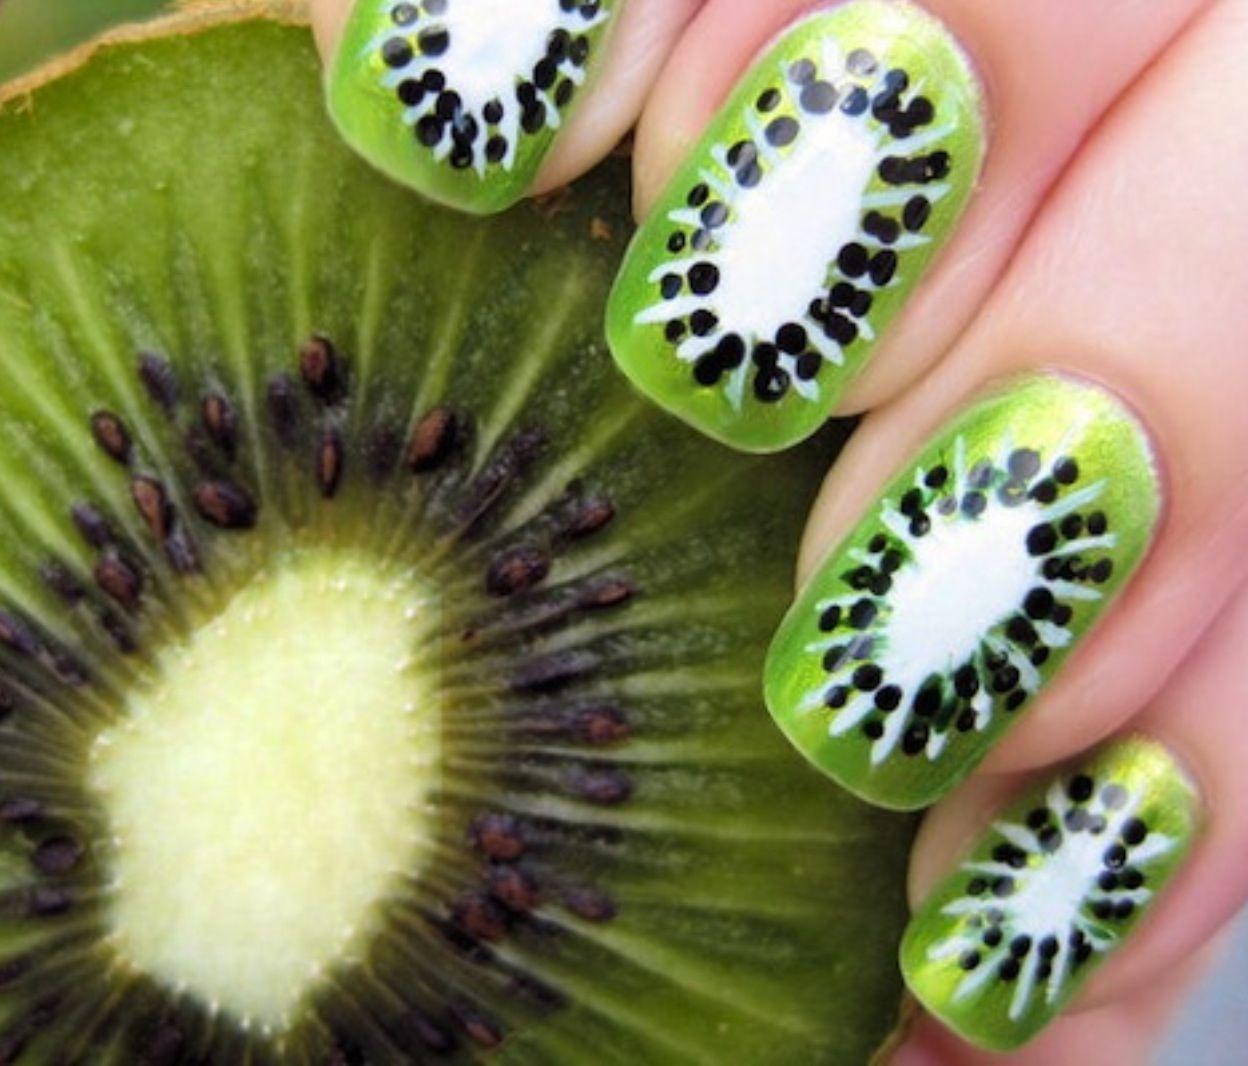 Kiwi nagels   nagels   Pinterest   Uñas diy, Bricolaje y Fruta